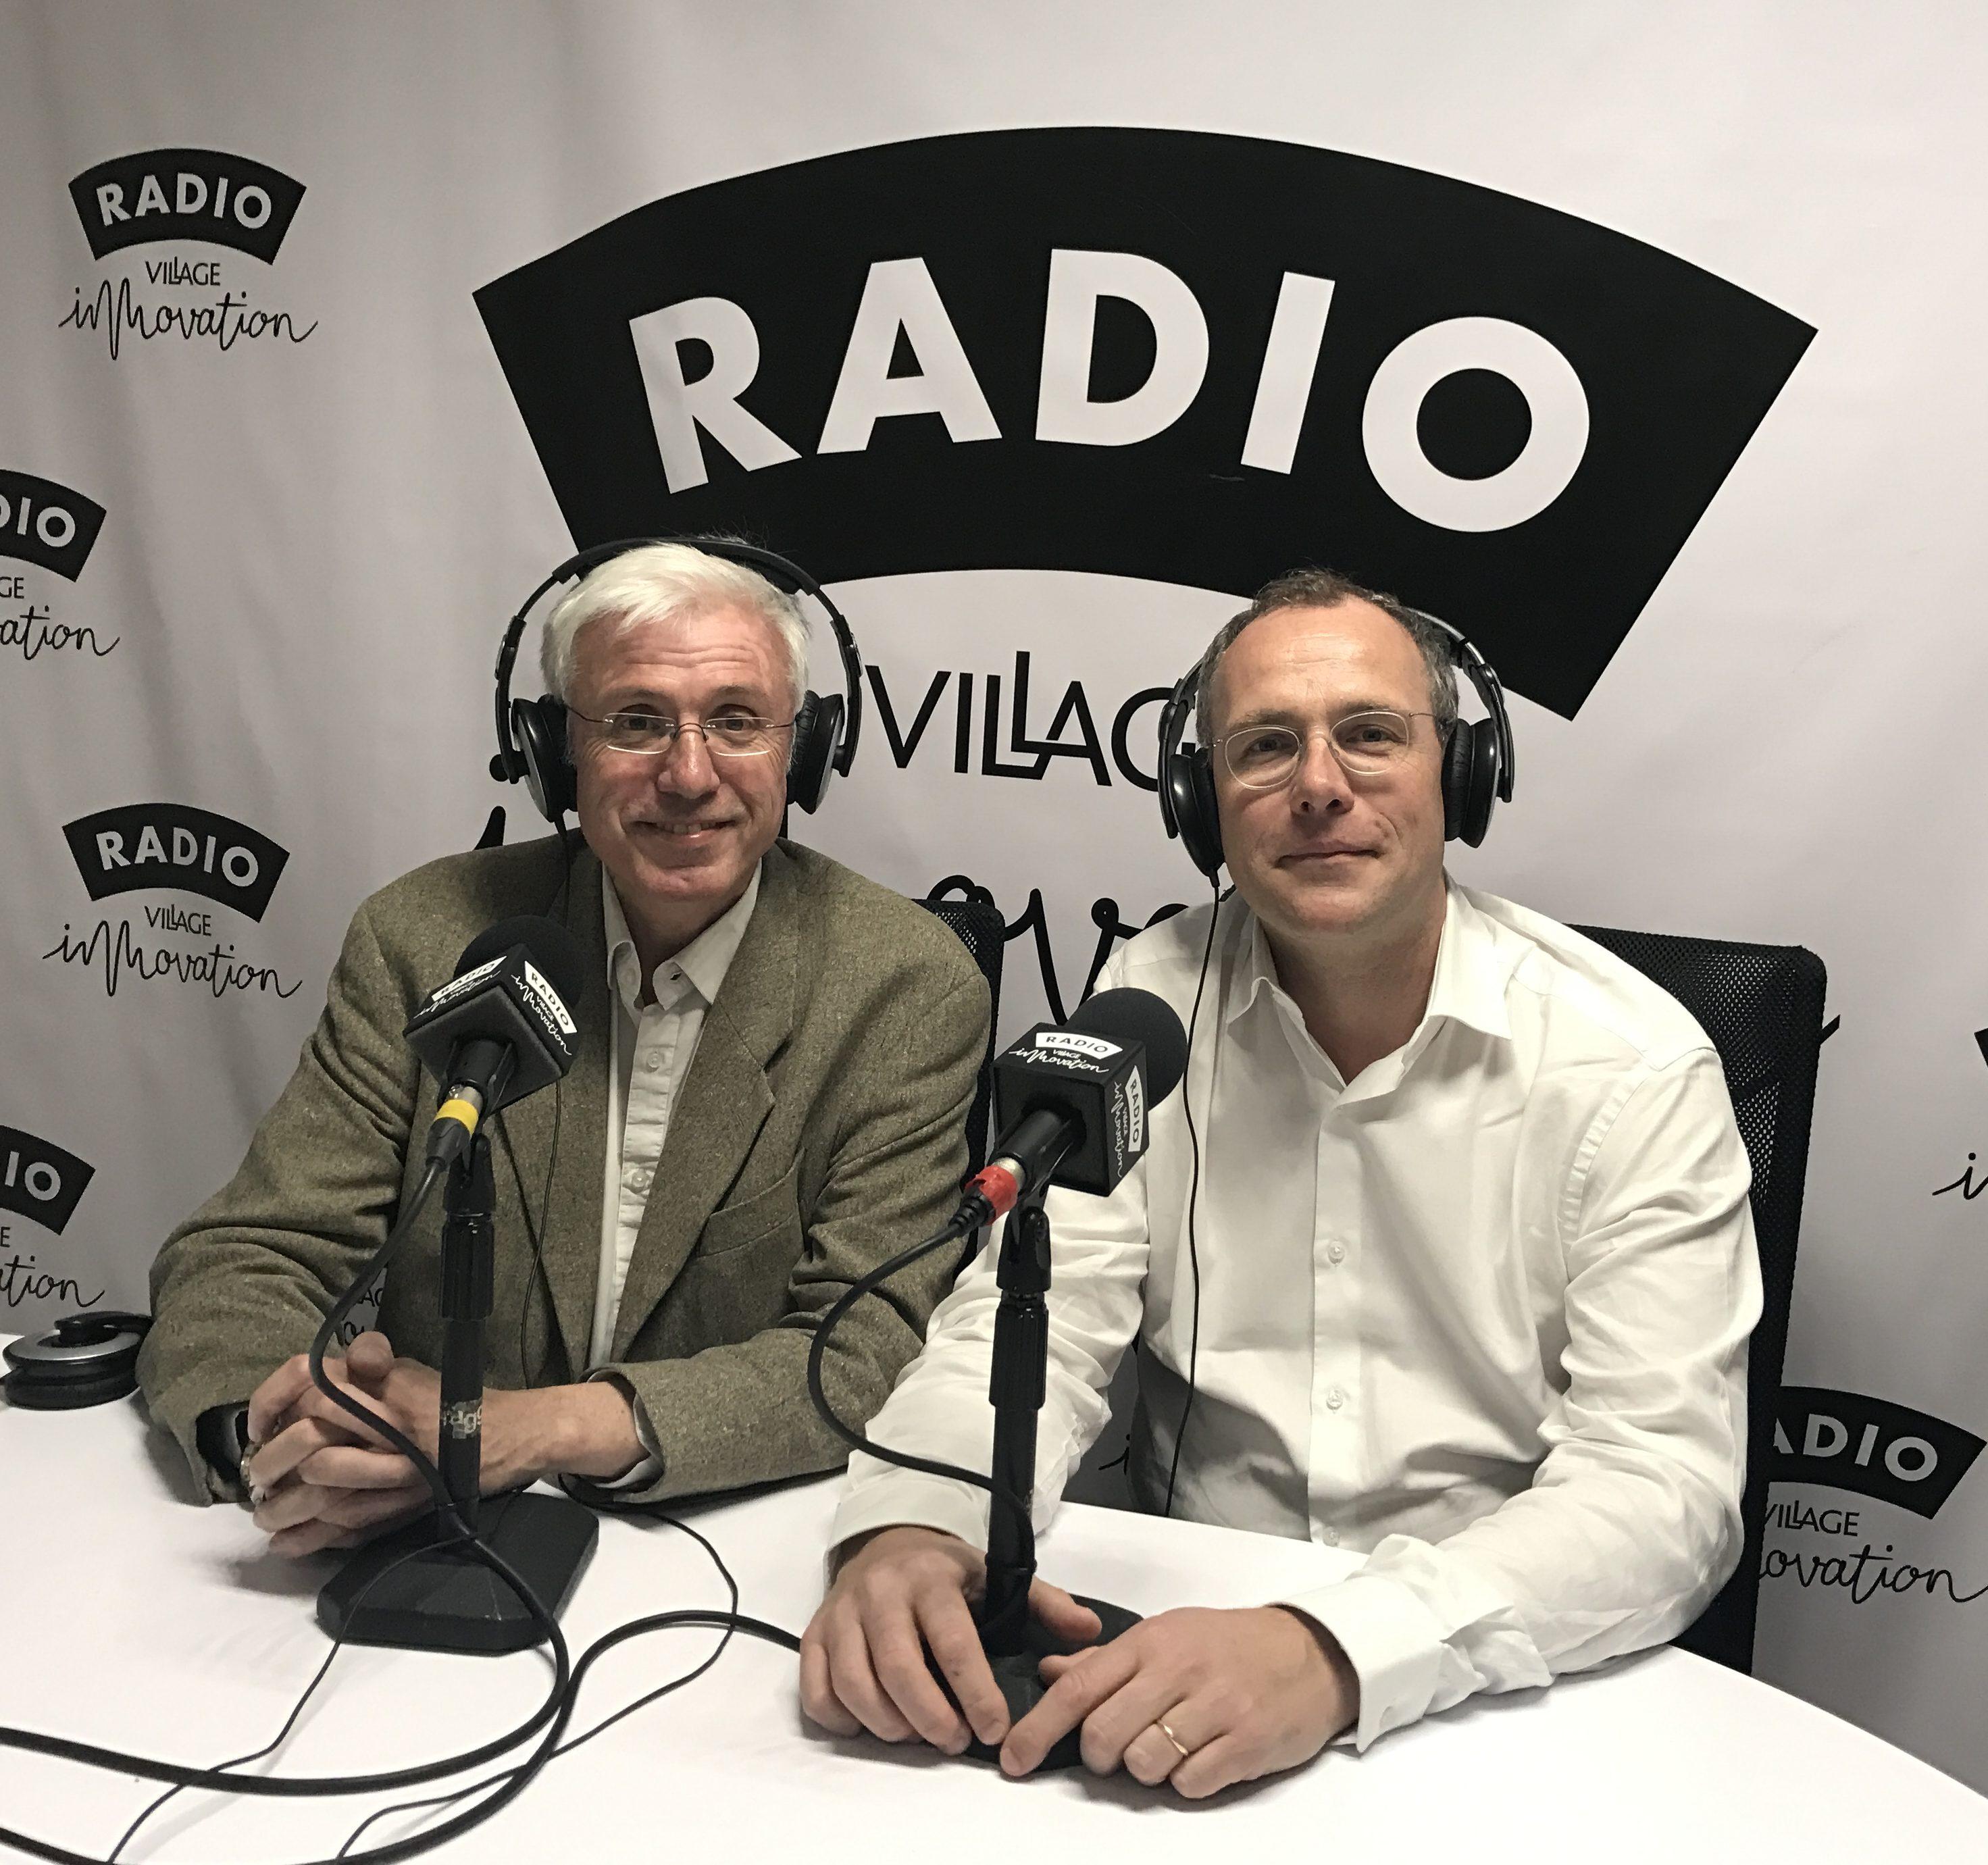 Didier Tranchier Radio Village Innovation